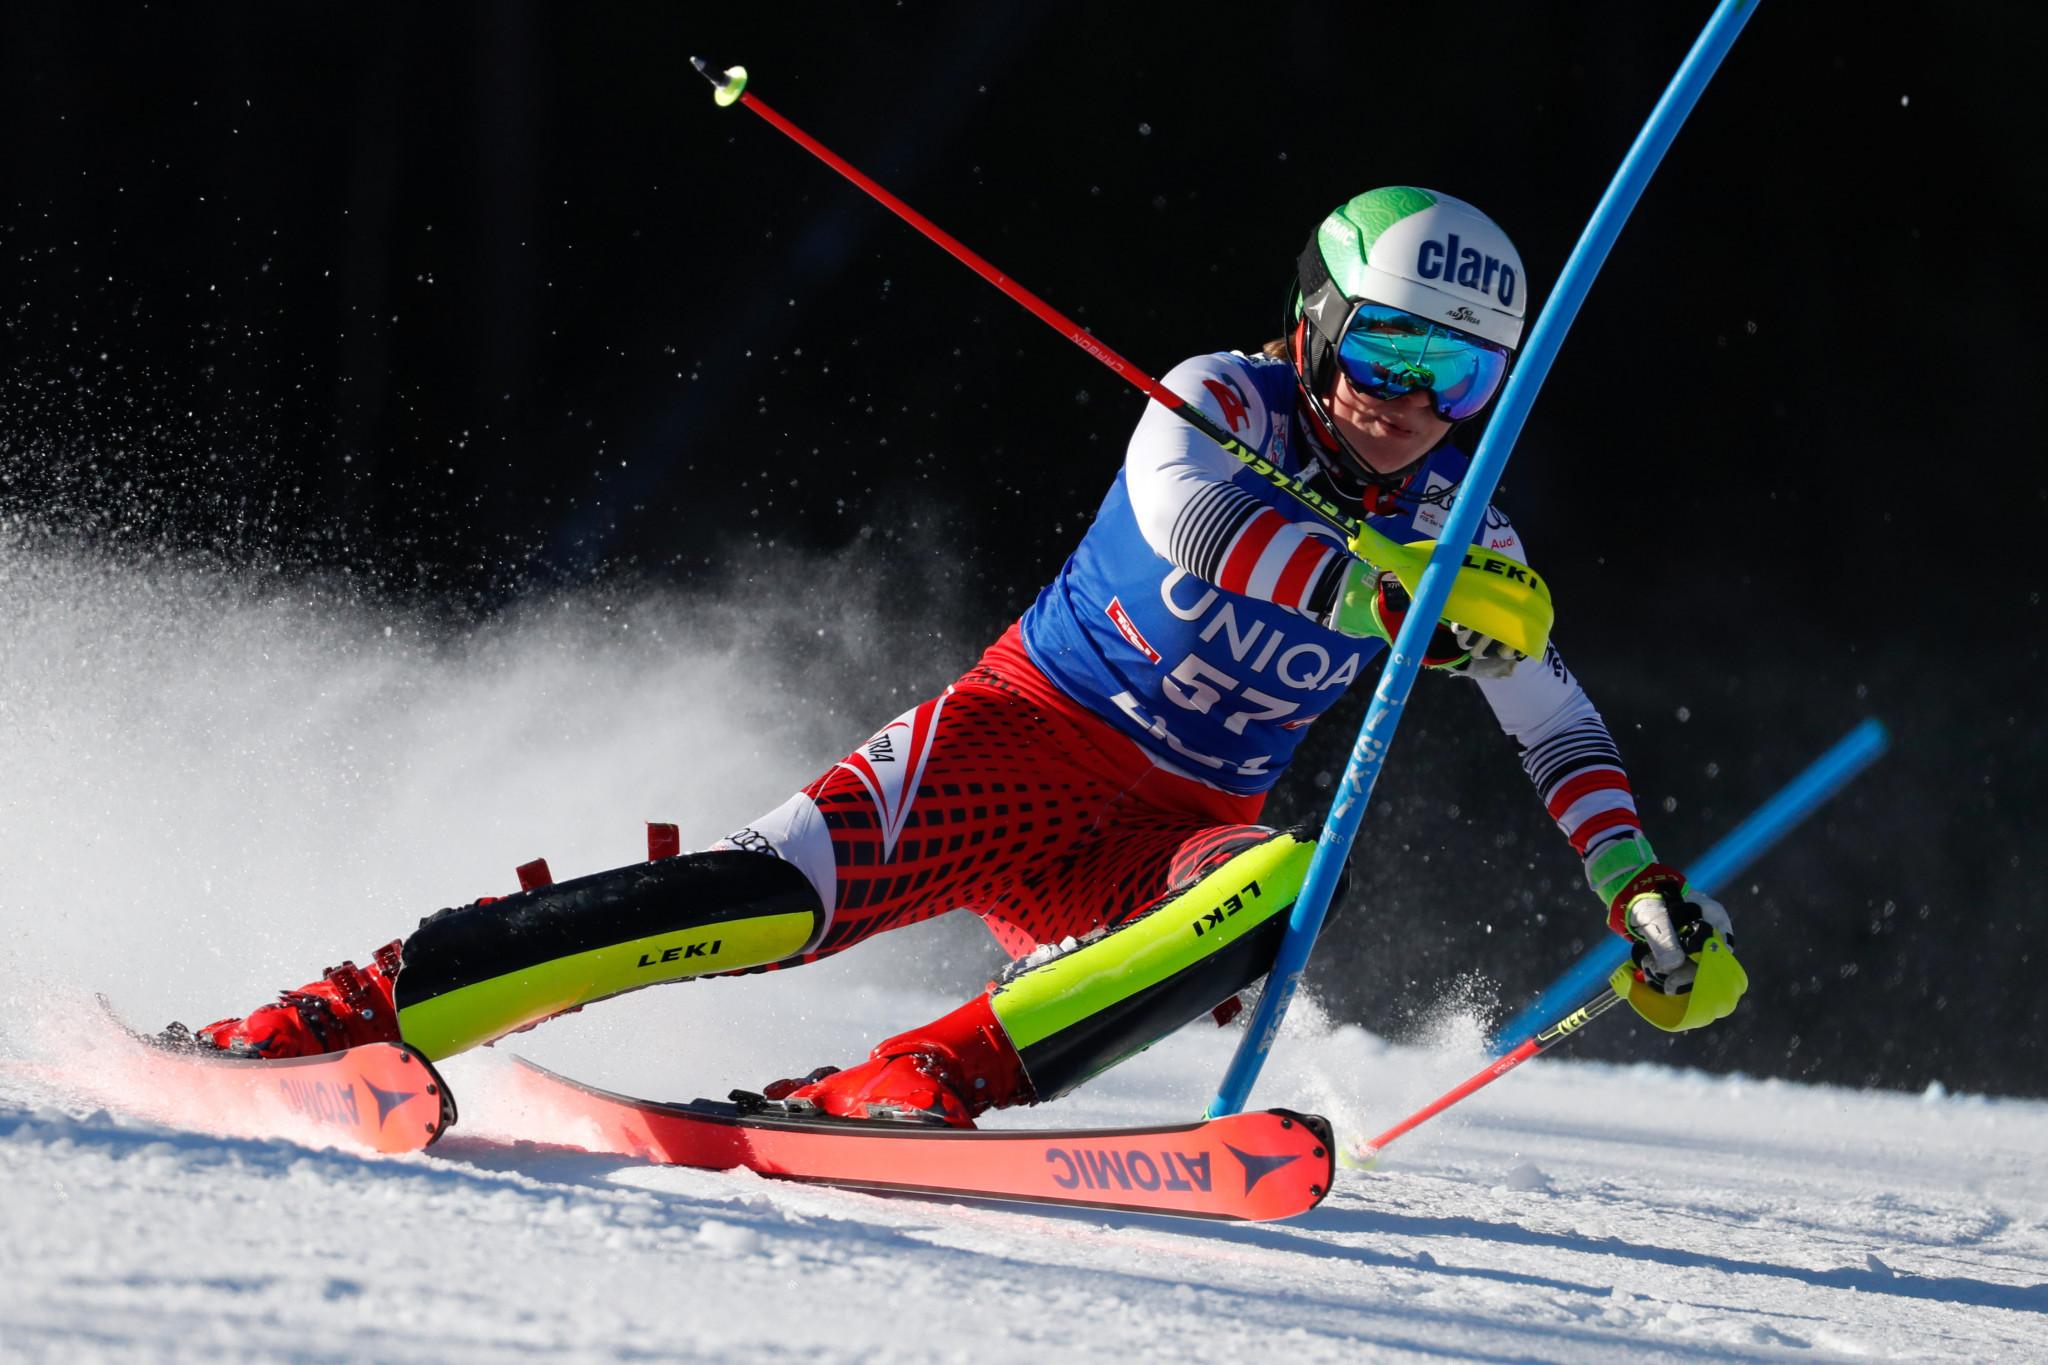 Austrian World Cup skier Dygruber announces retirement